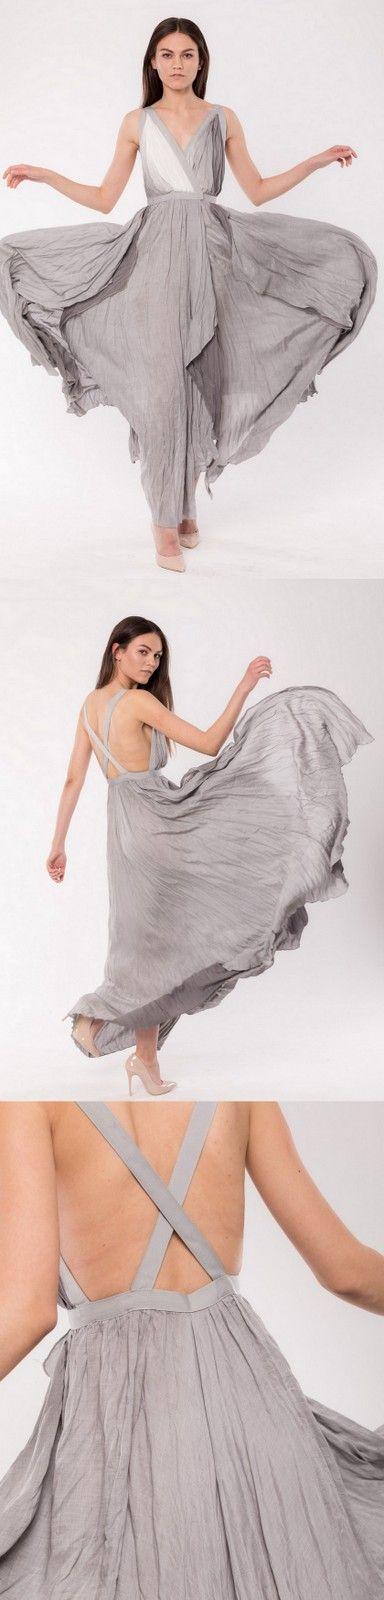 made to order 'red carpet' dress, designer Anna Fludra